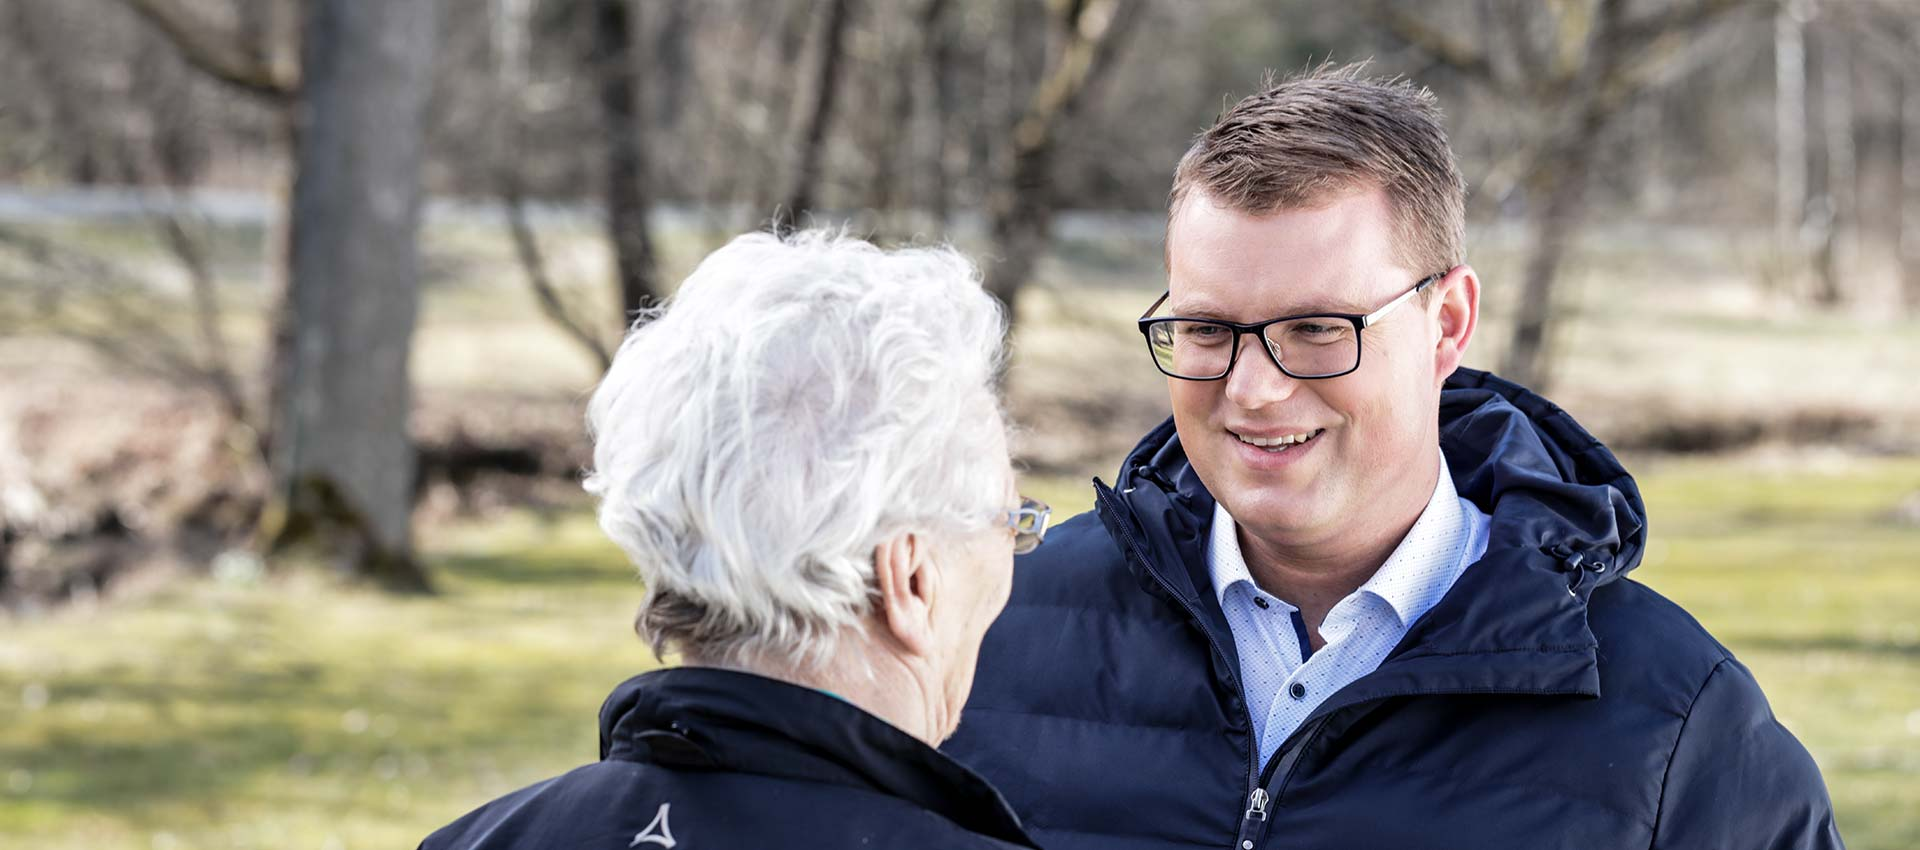 Holger Grießhammer im Gespräch mit Bürgern